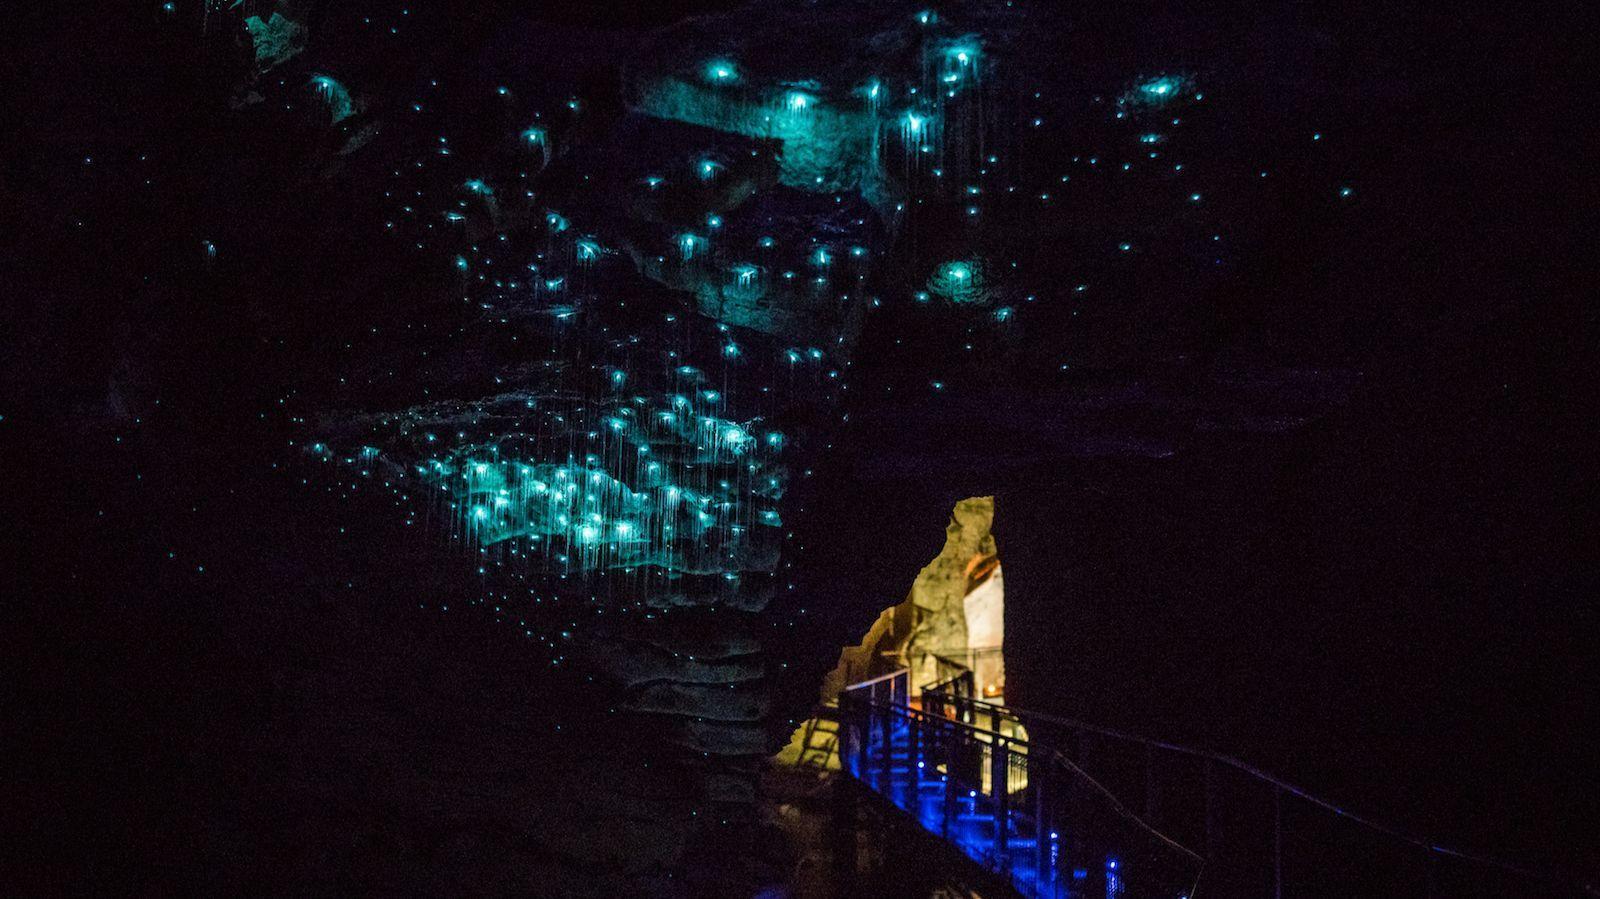 Glow worms at the Waitomo Caves.